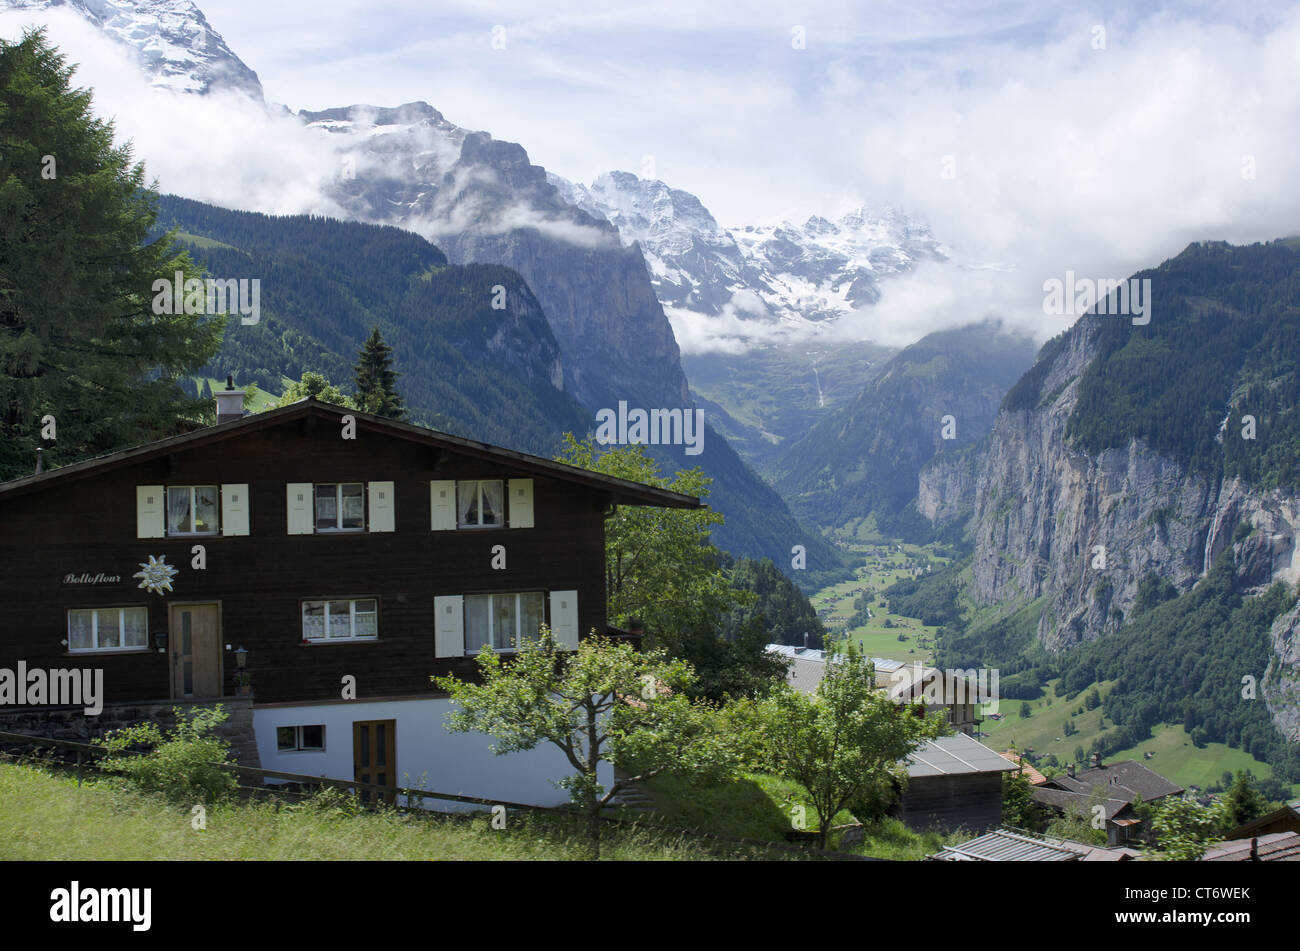 Landscape, Lauterbrunnen, Switzerland - Stock Image